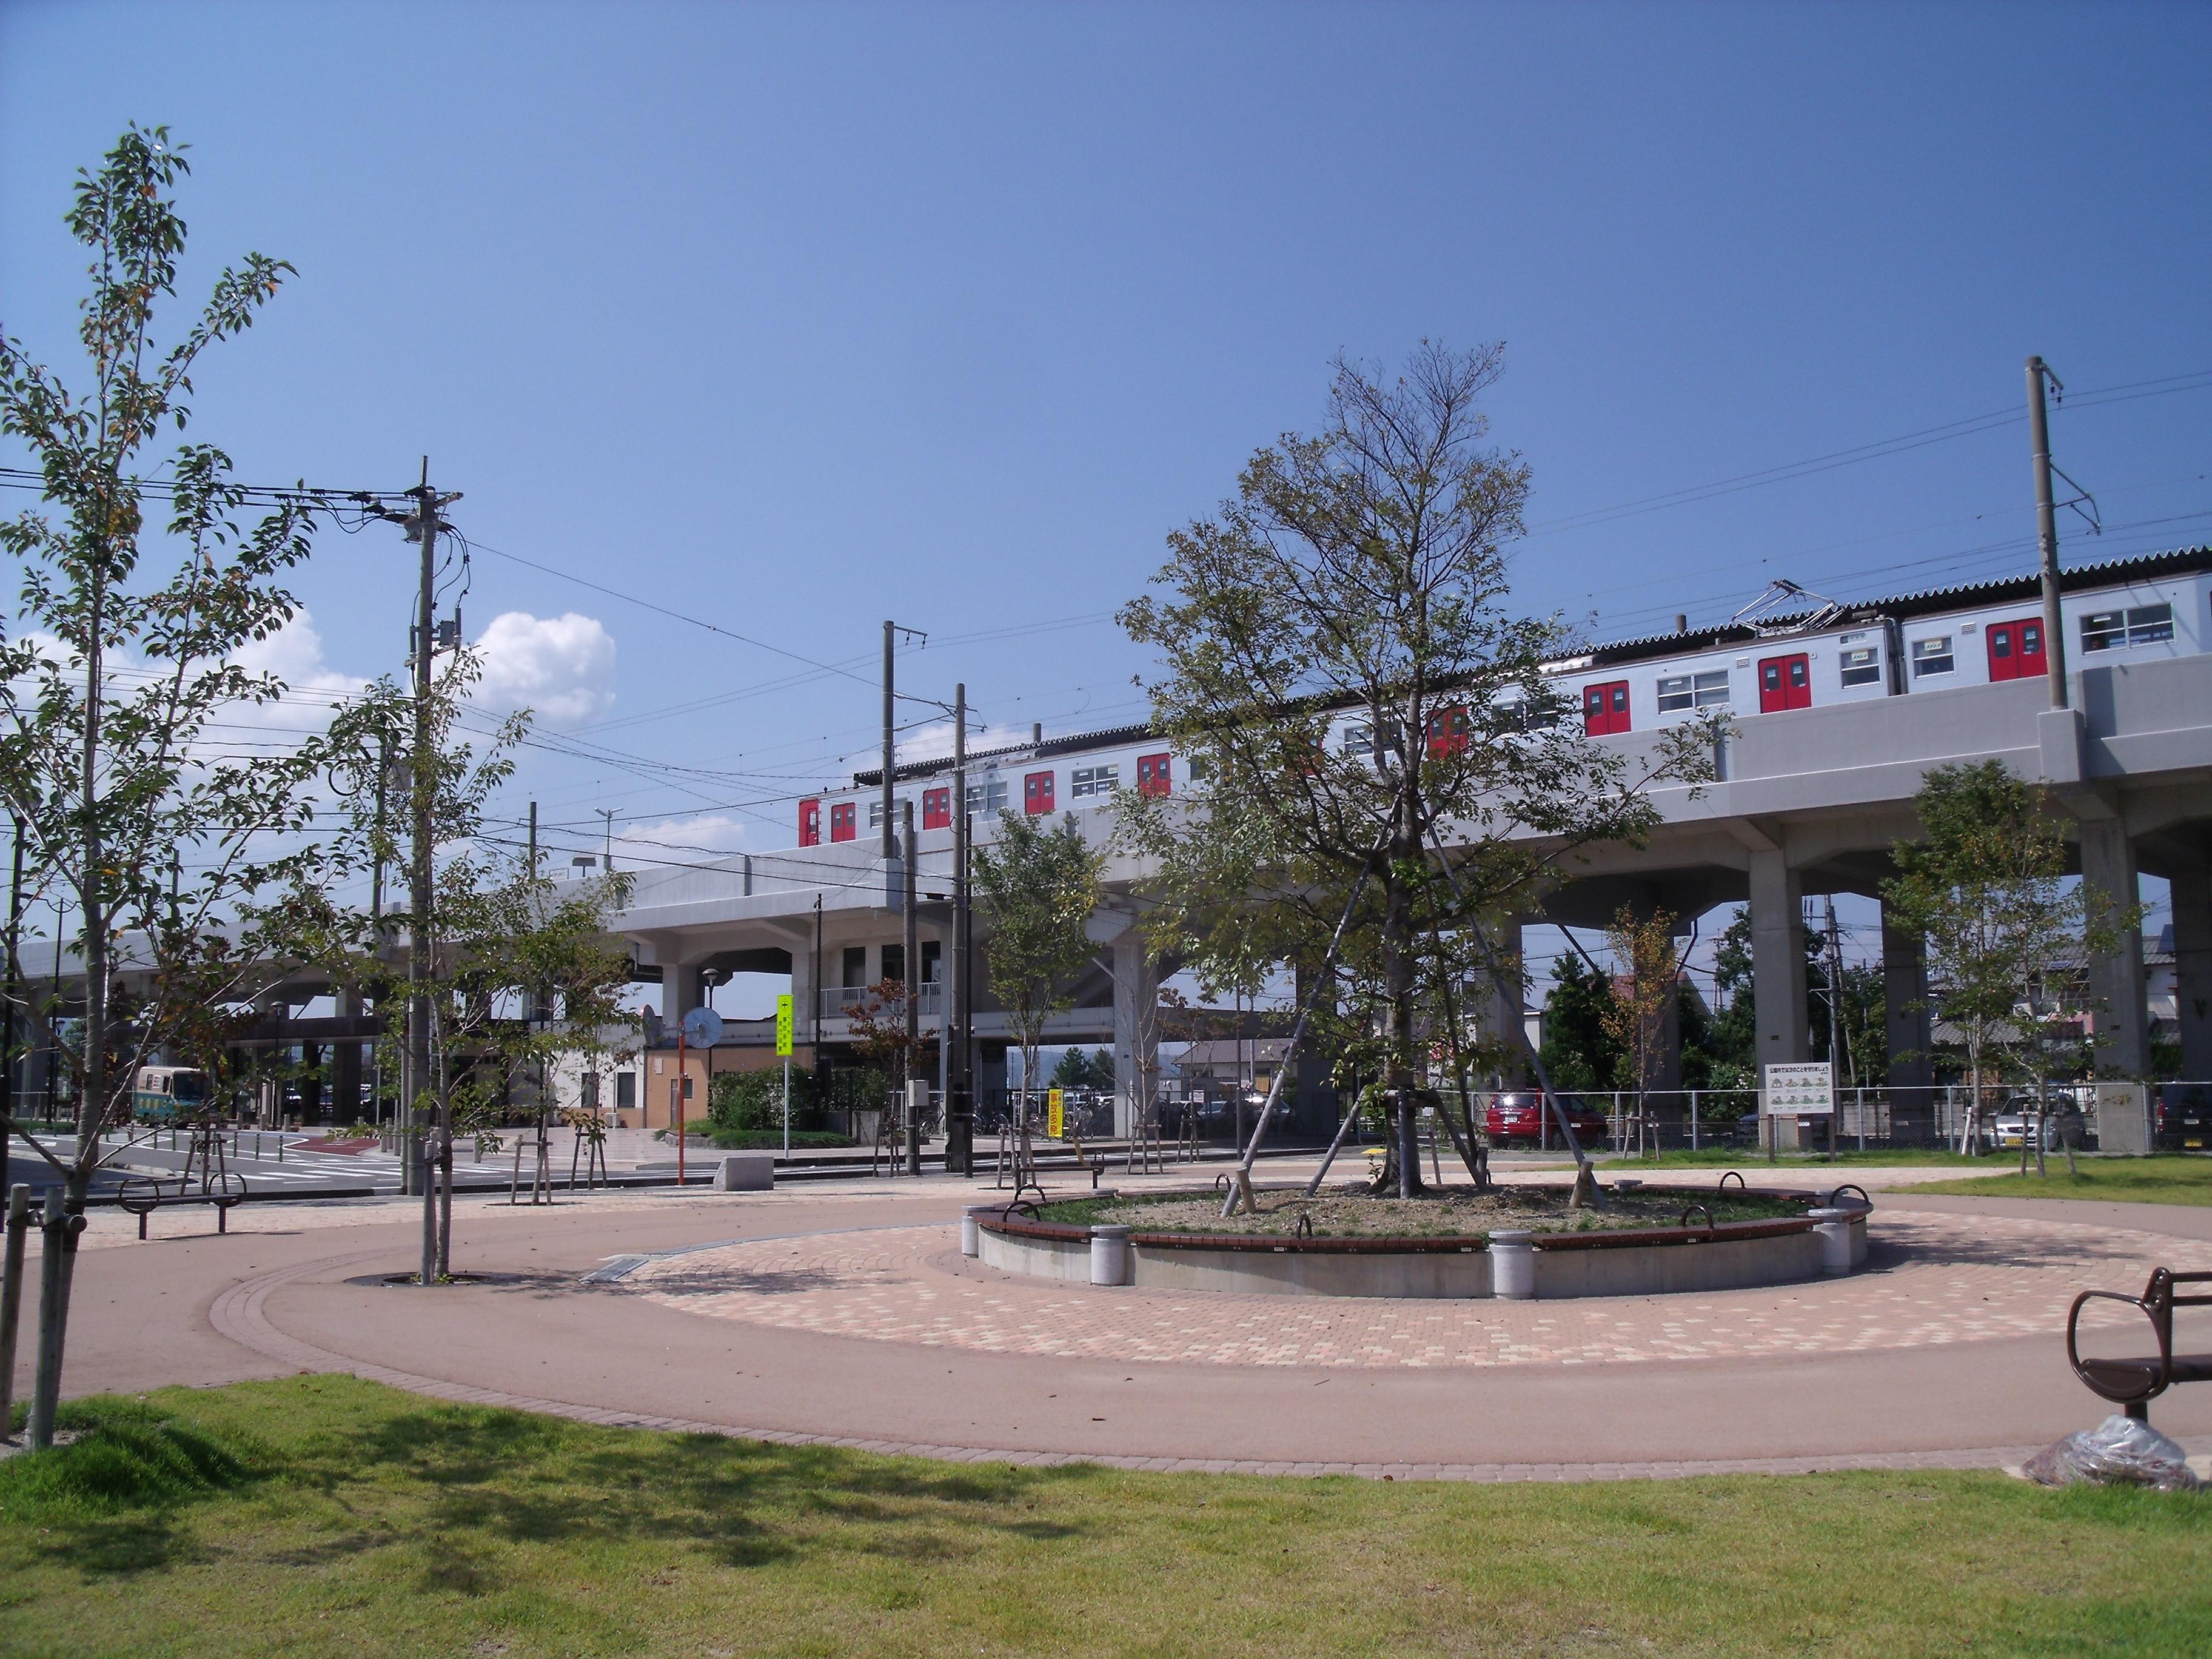 https://upload.wikimedia.org/wikipedia/commons/9/9f/Higashi-Karatsu_Station_3.JPG